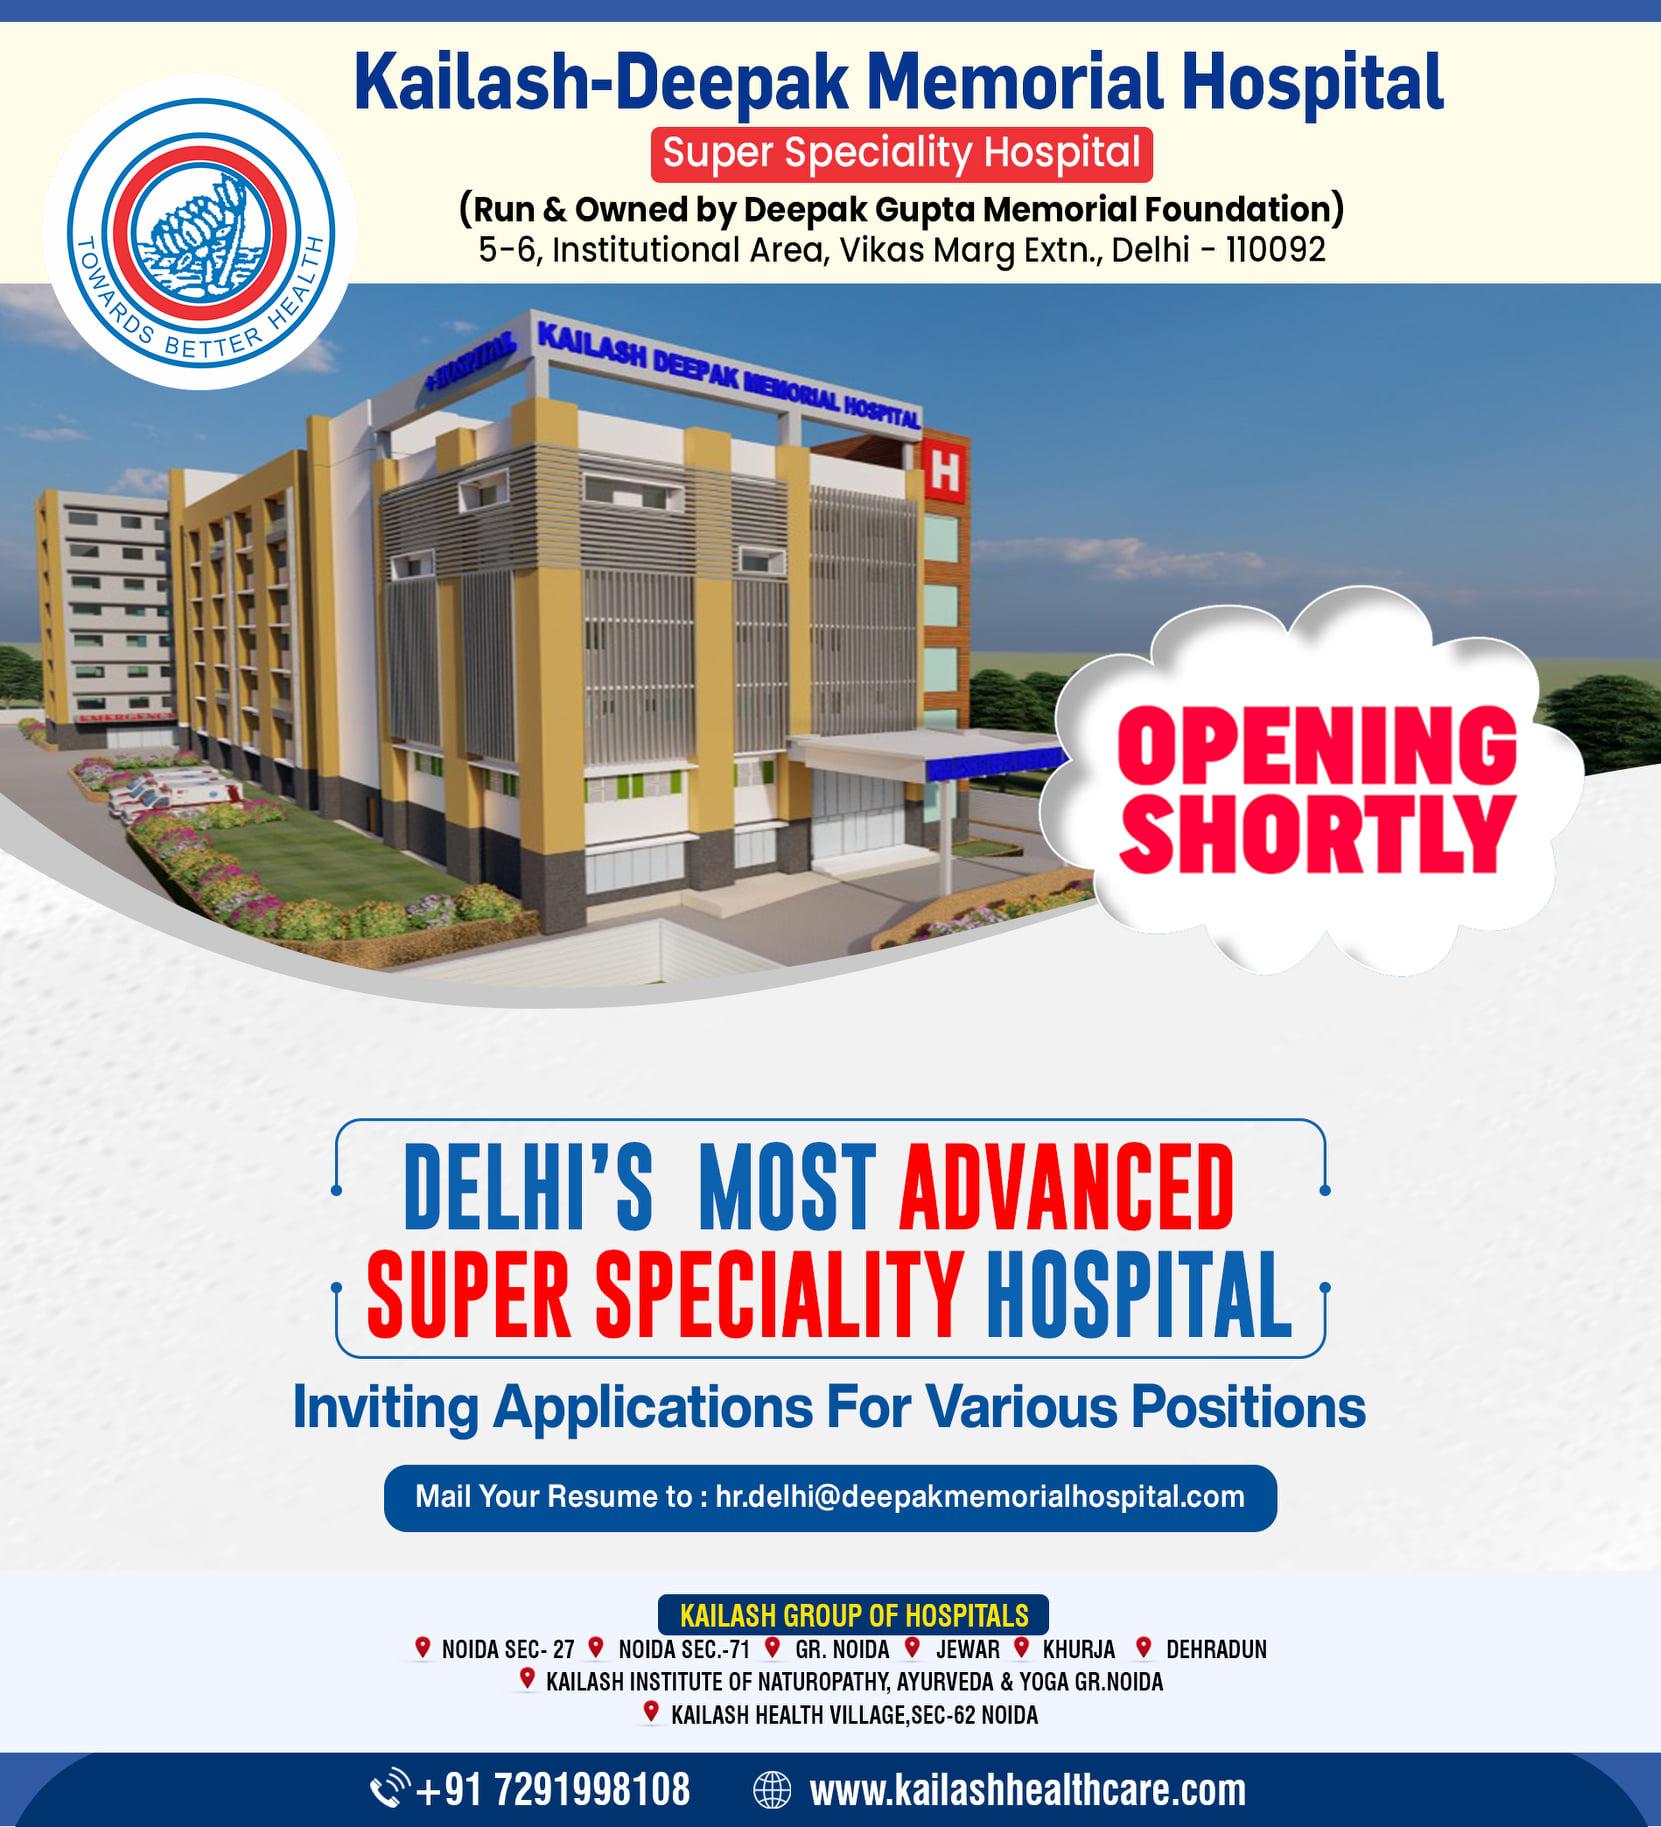 Delhi's Most Advanced Super Speciality Hospital - Kailash Deepak Memorial Hospital Inviting Applications for various positions.